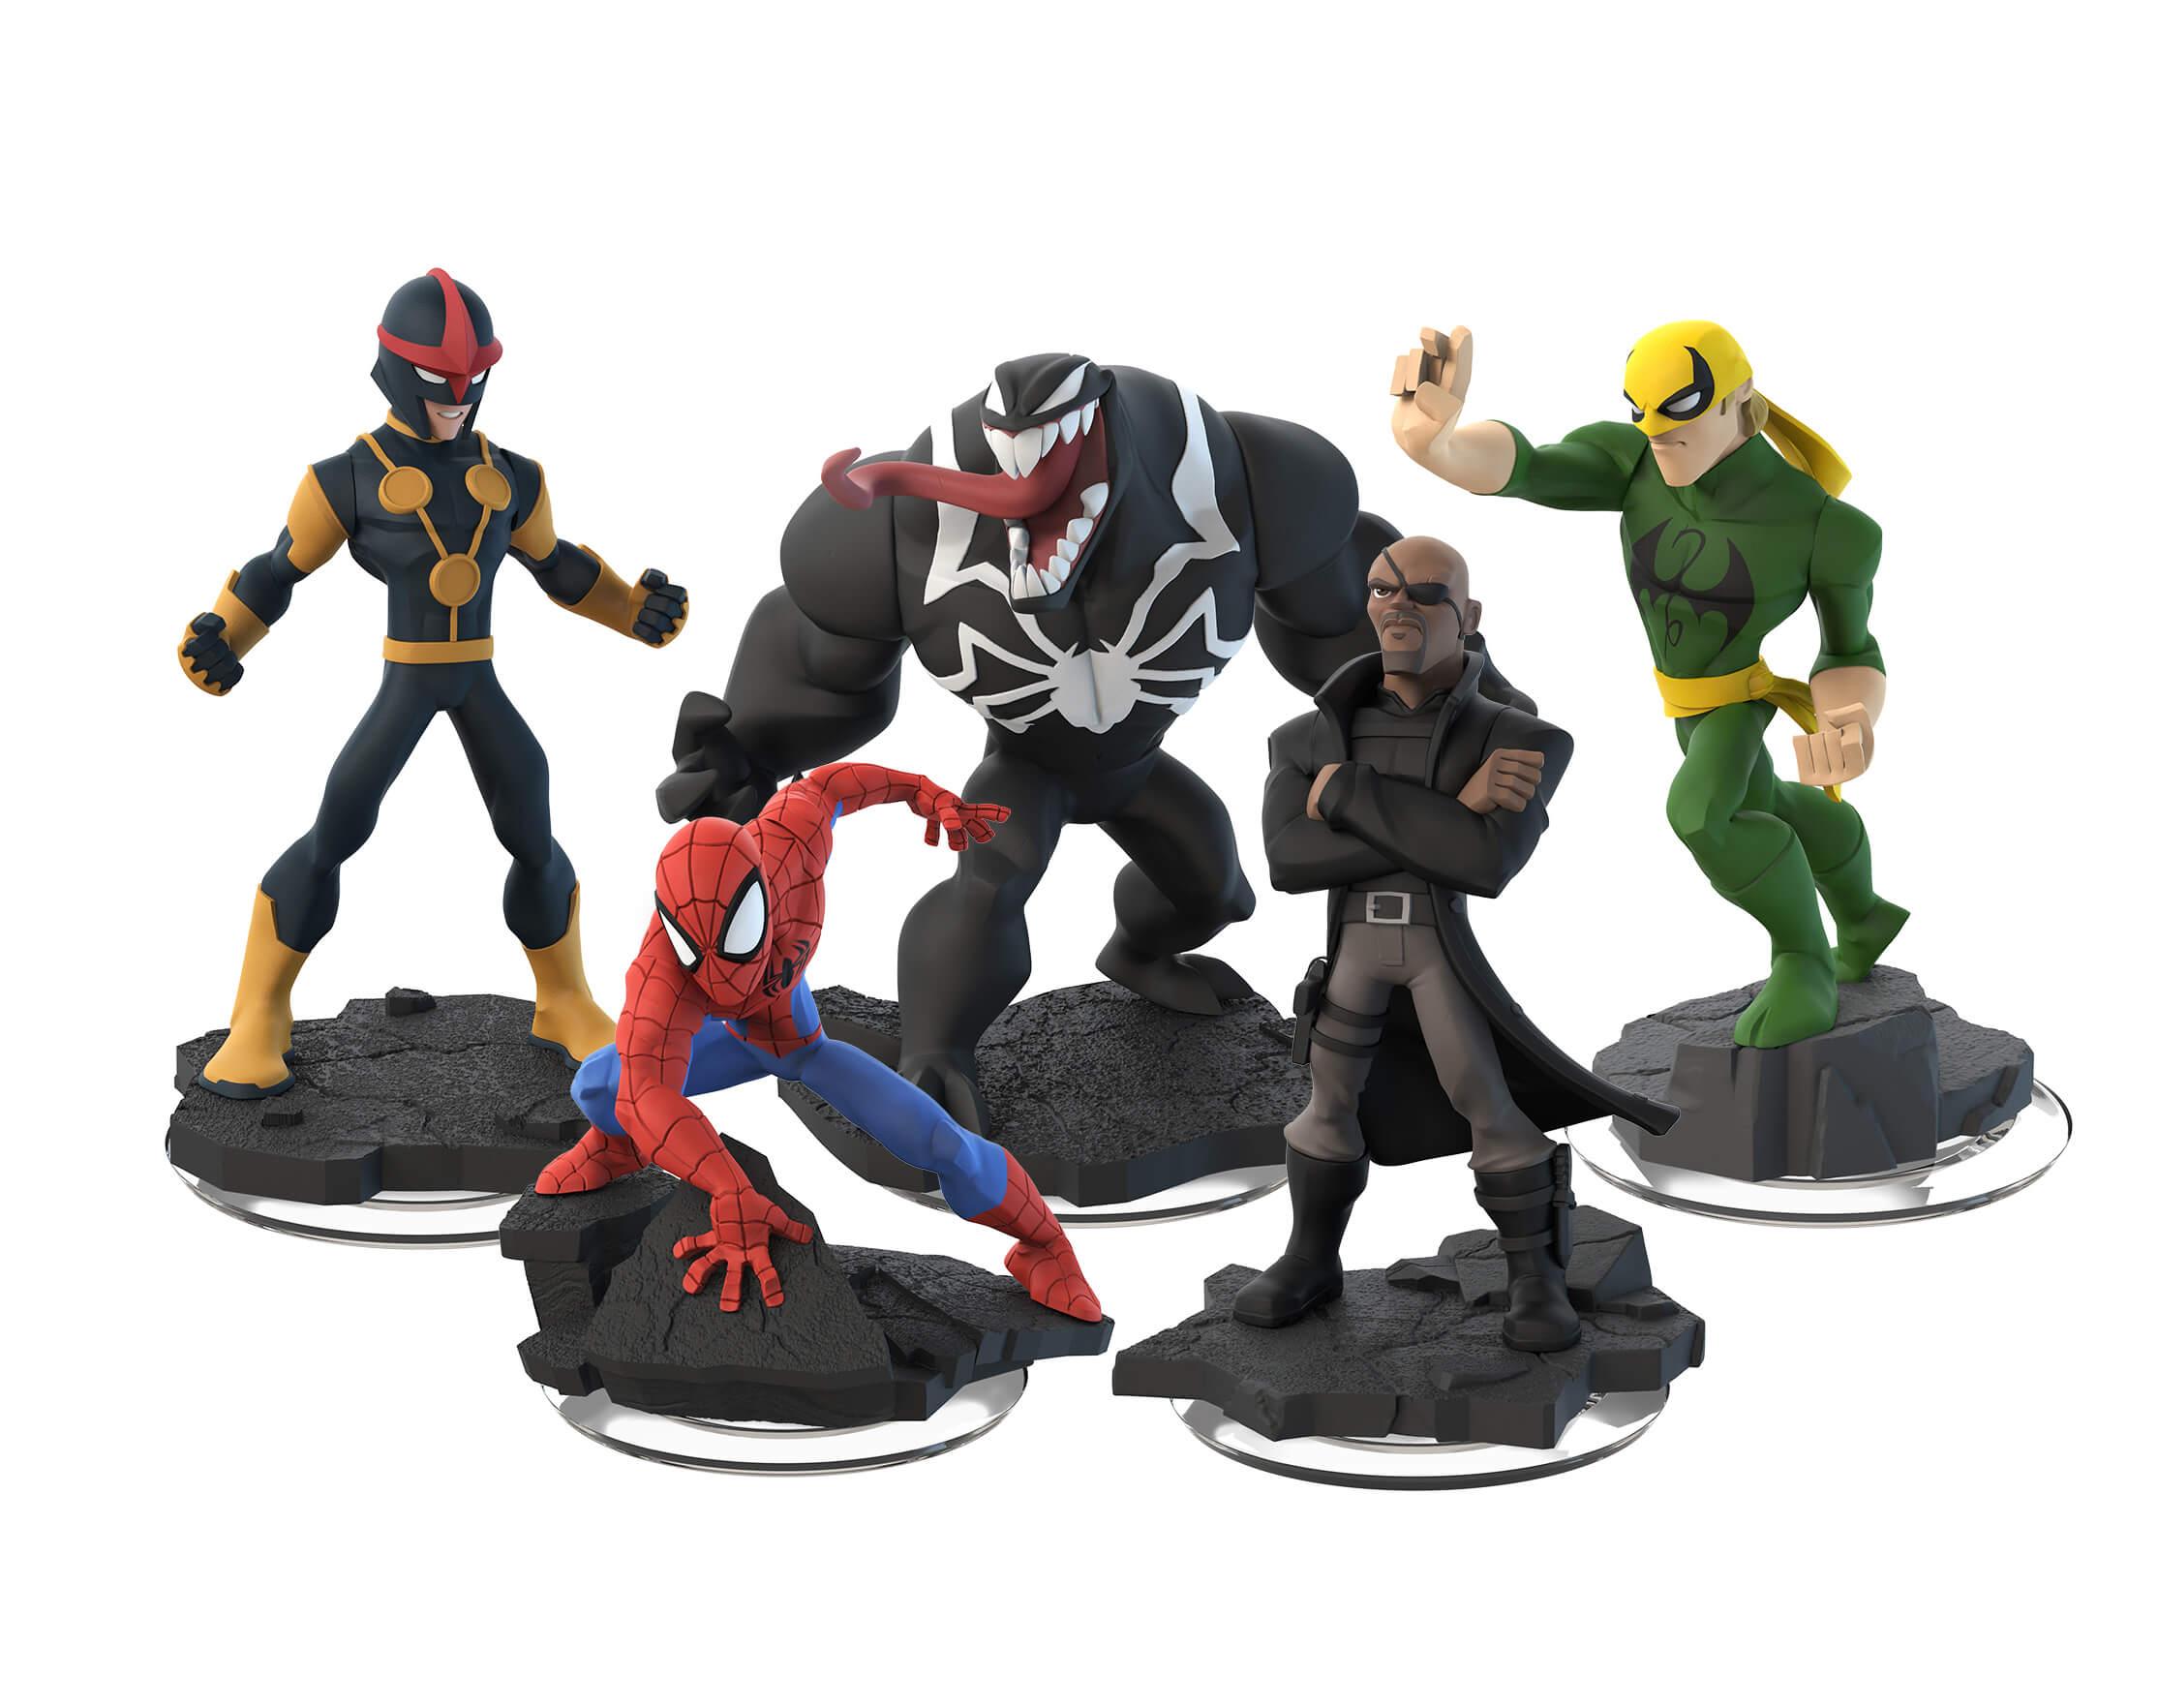 Marvel Takes The Spotlight In 'Disney Infinity 2.0' Toy Box Trailer